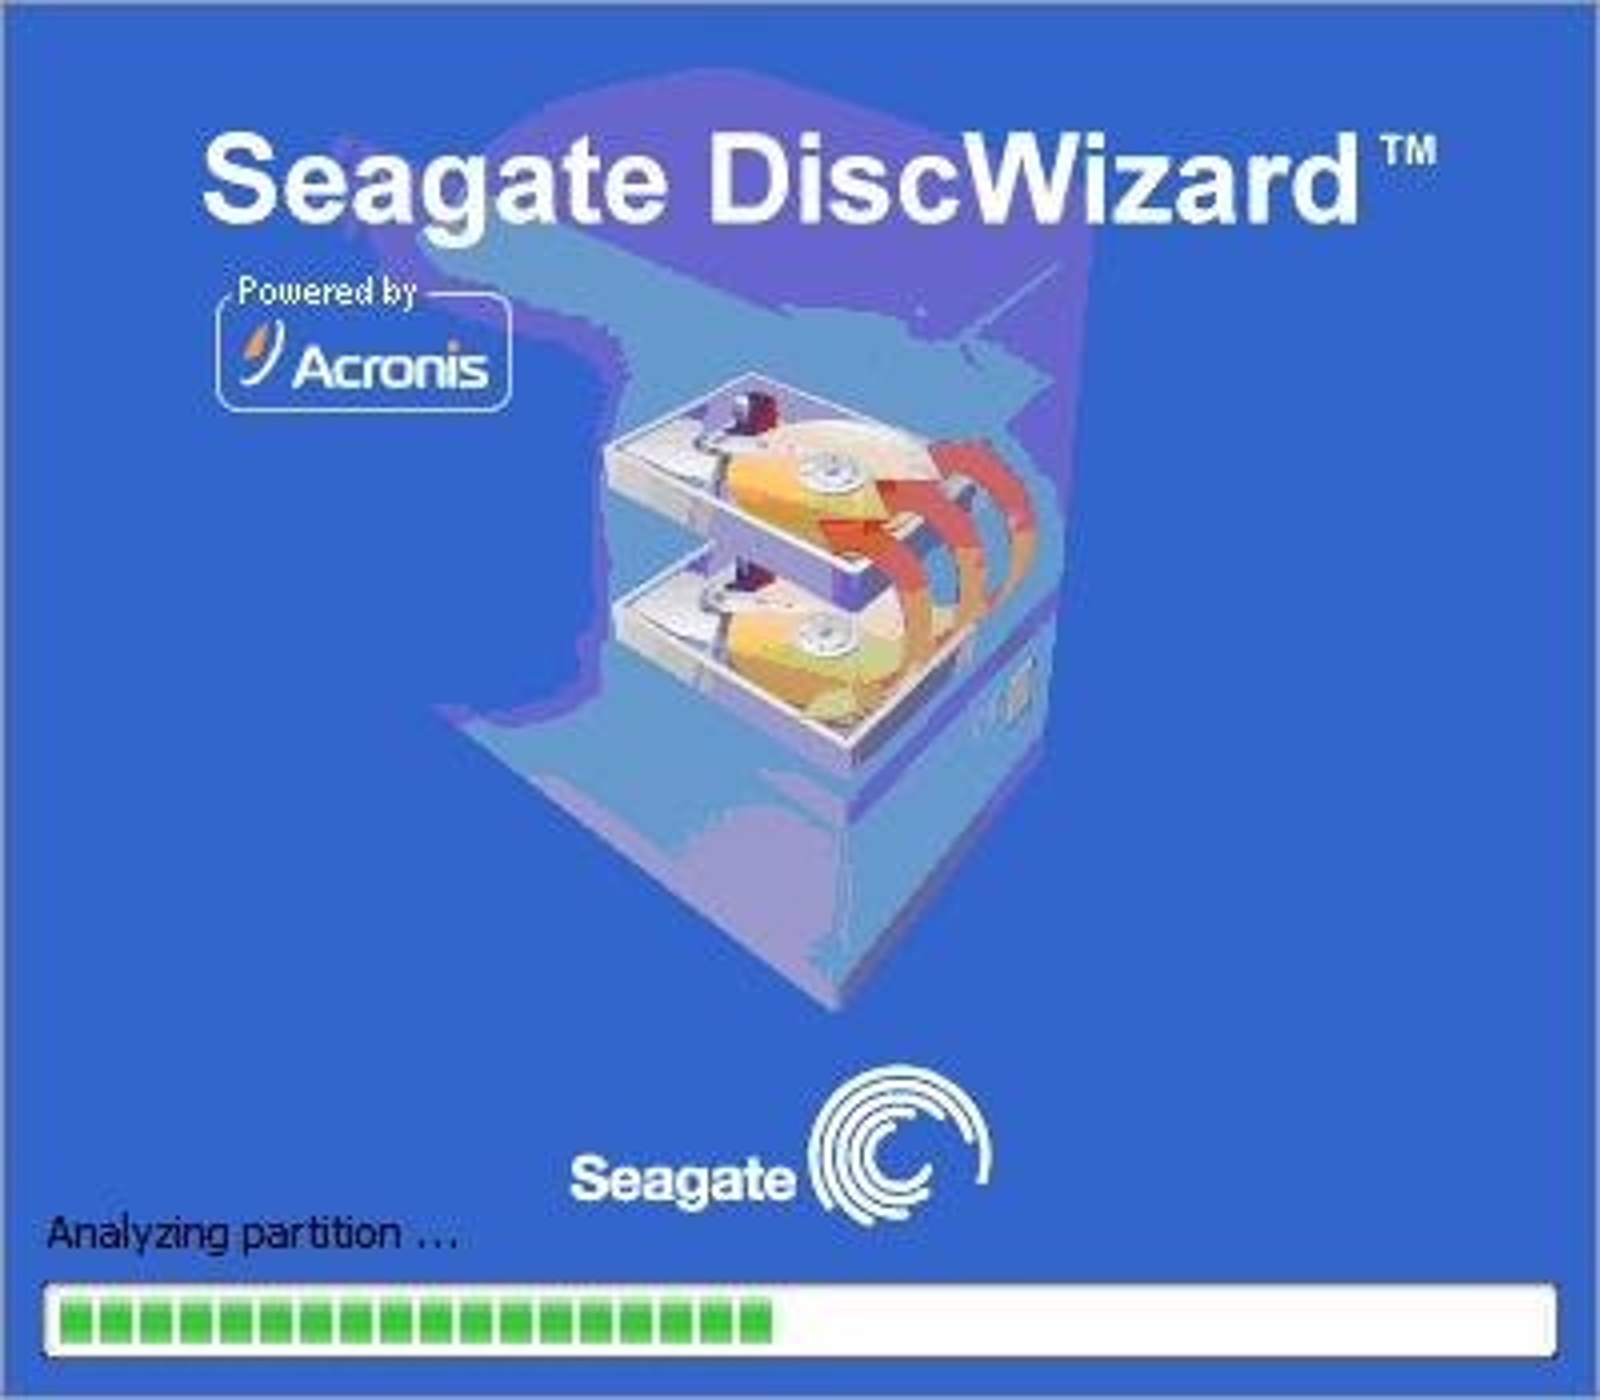 Seagate DiscWizard